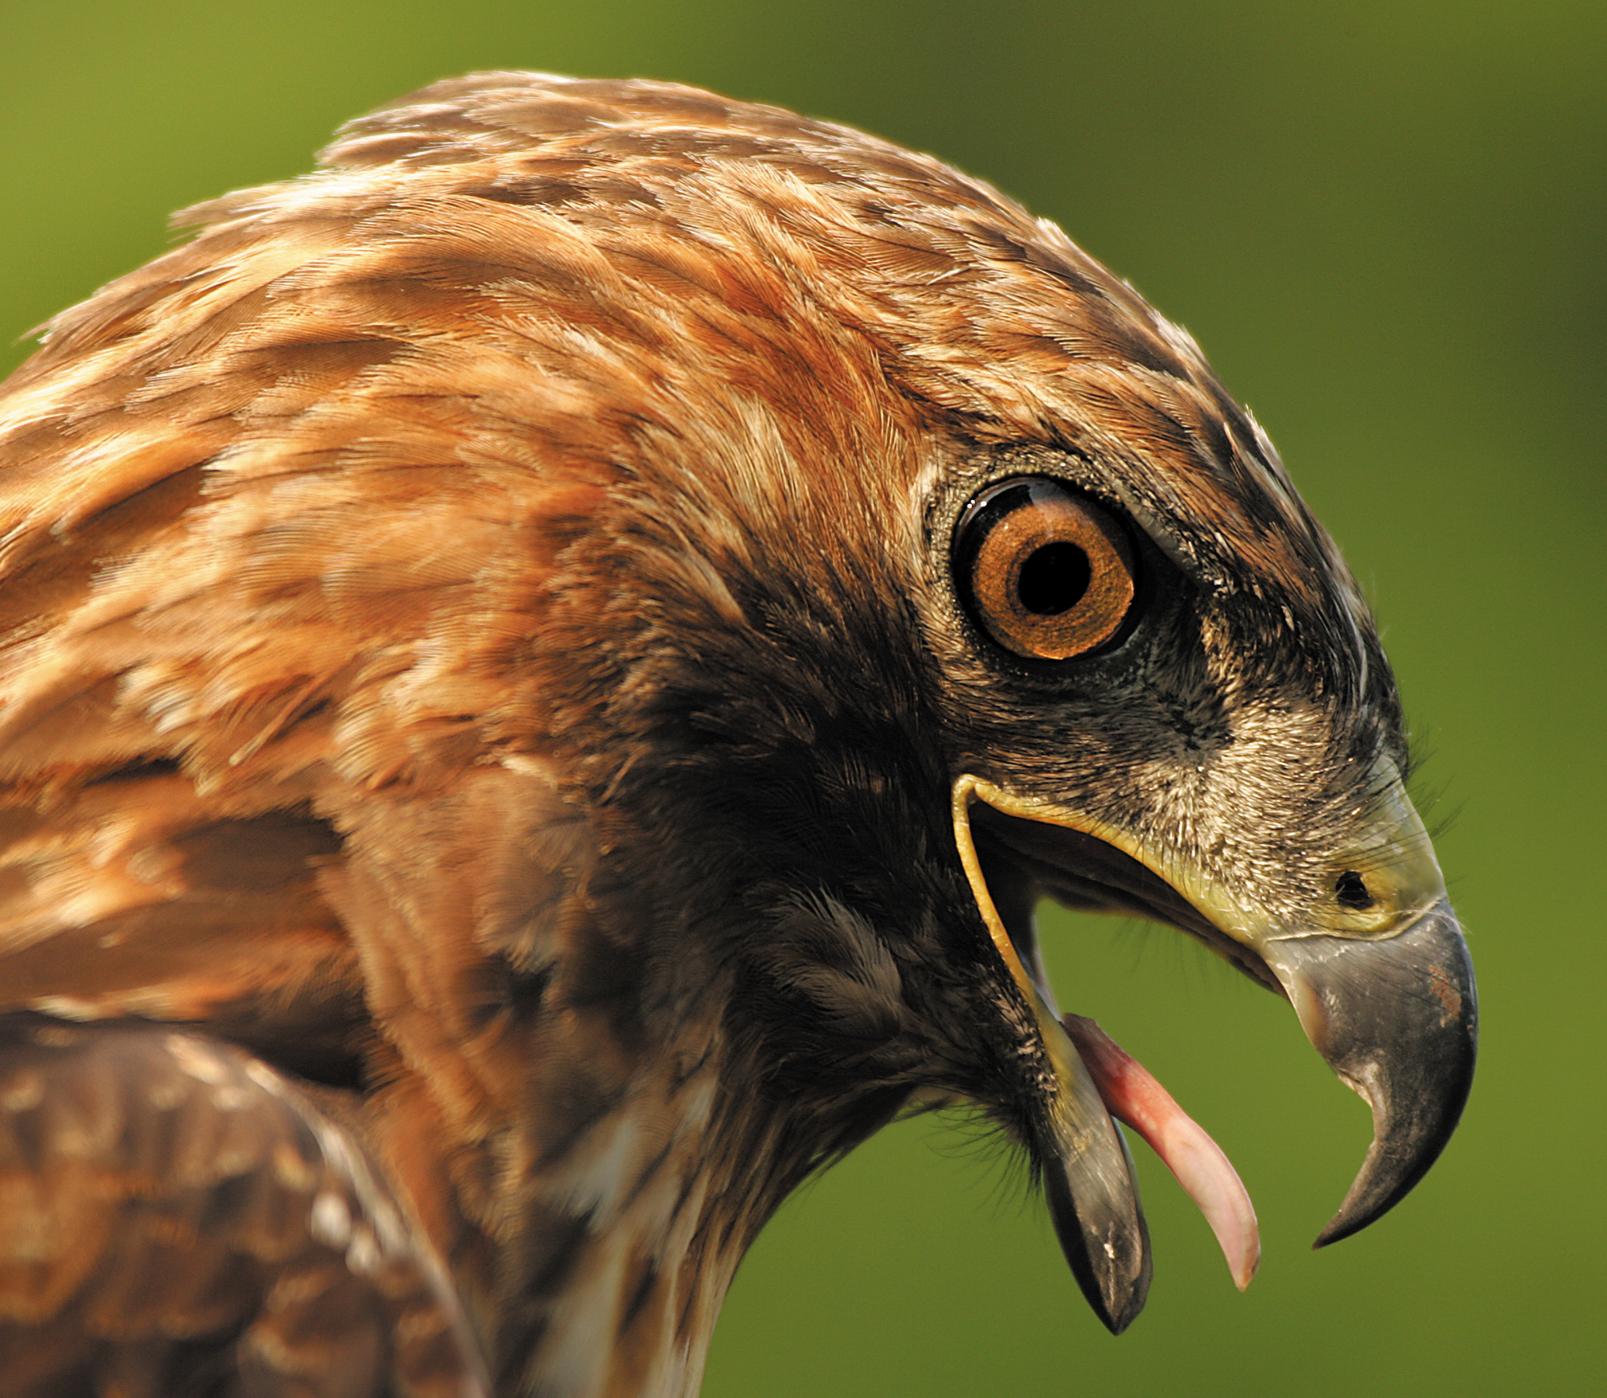 Rick Sammon's Birds021.jpg